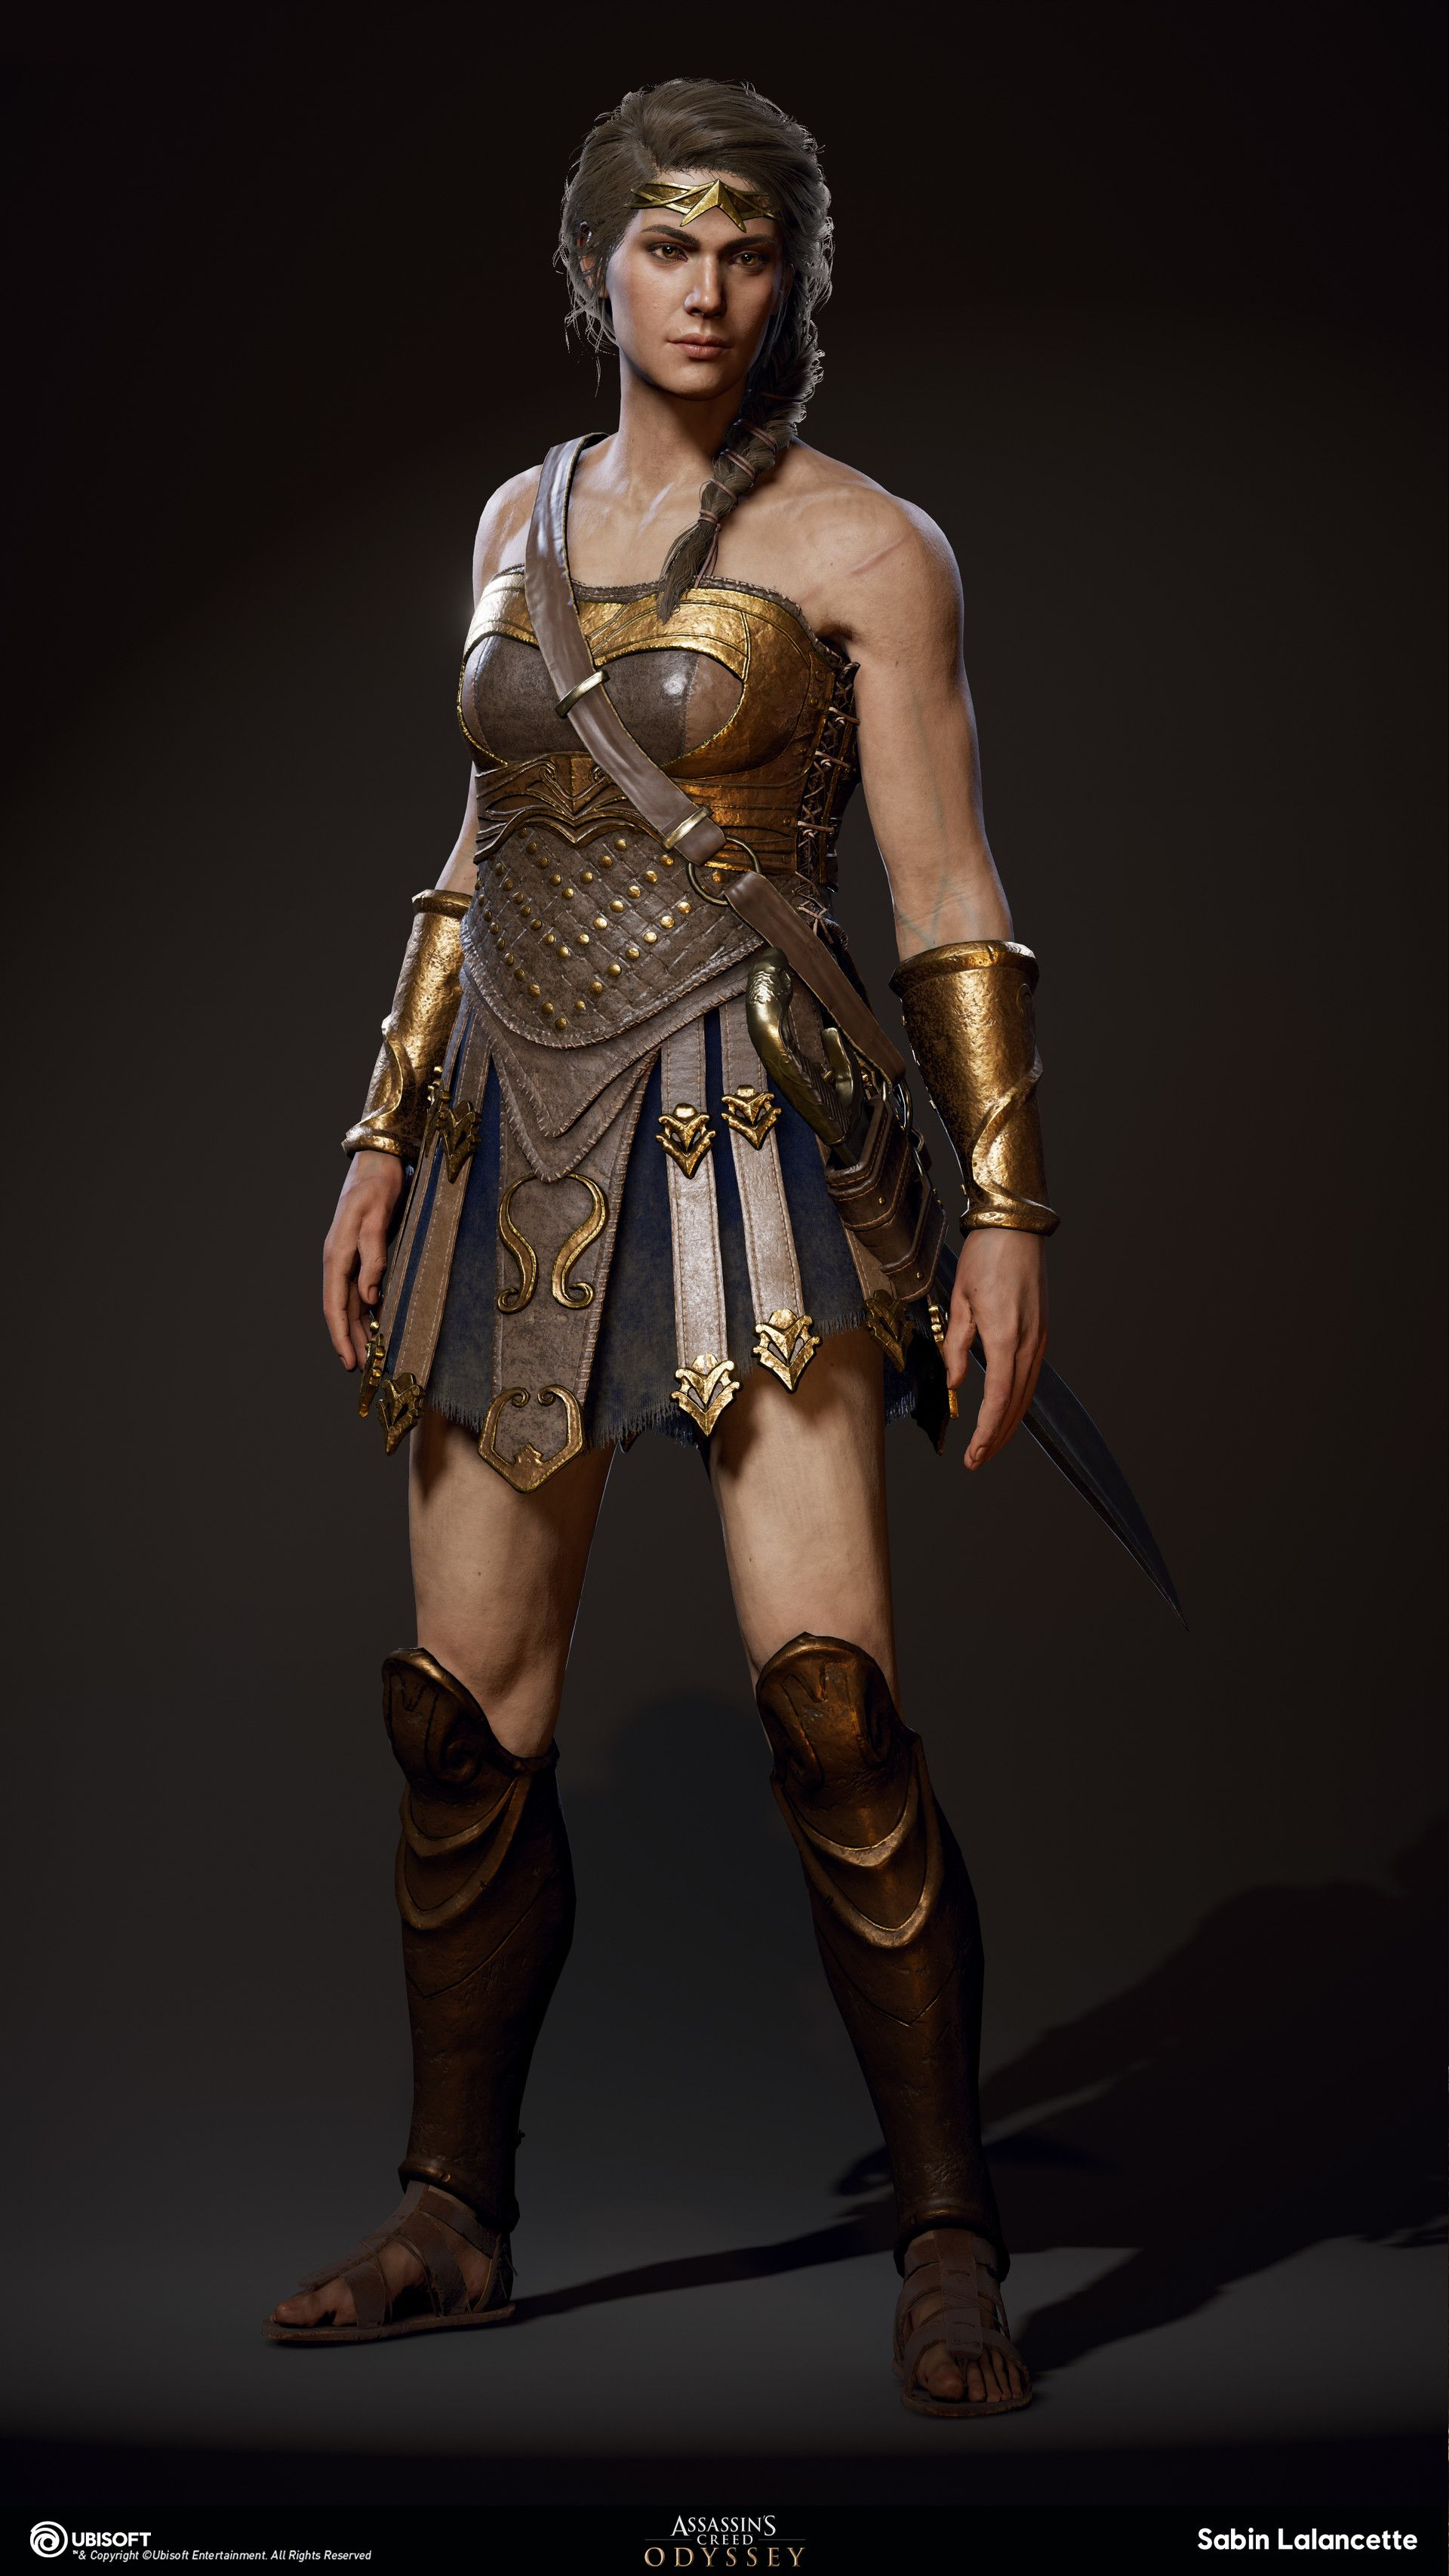 Https Www Artstation Com Artwork 8lw2ke Assassins Creed Art Assassins Creed Odyssey Warrior Outfit